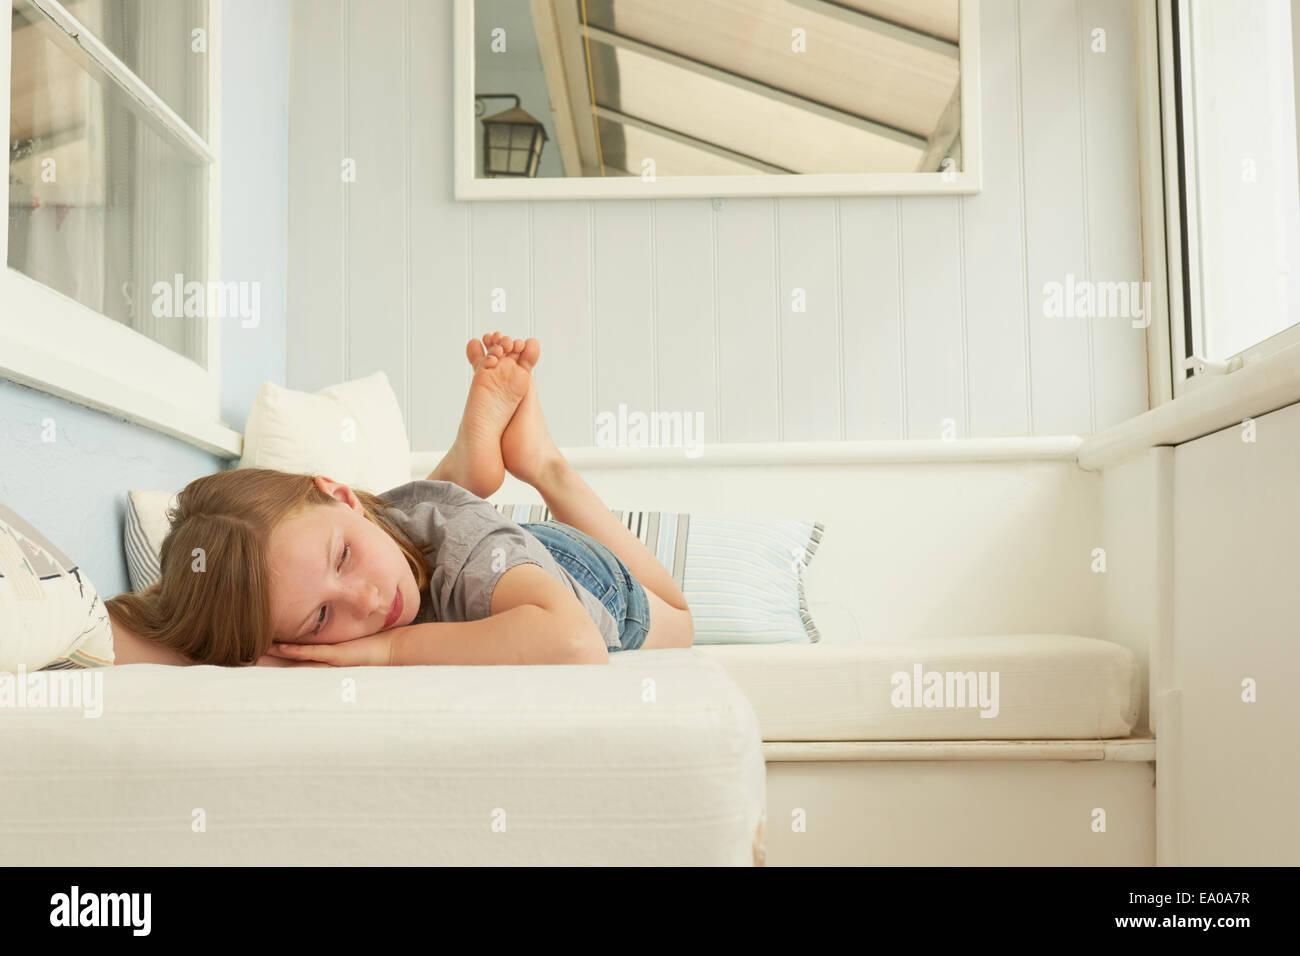 Sullen girl acostado en apartamento asiento Imagen De Stock